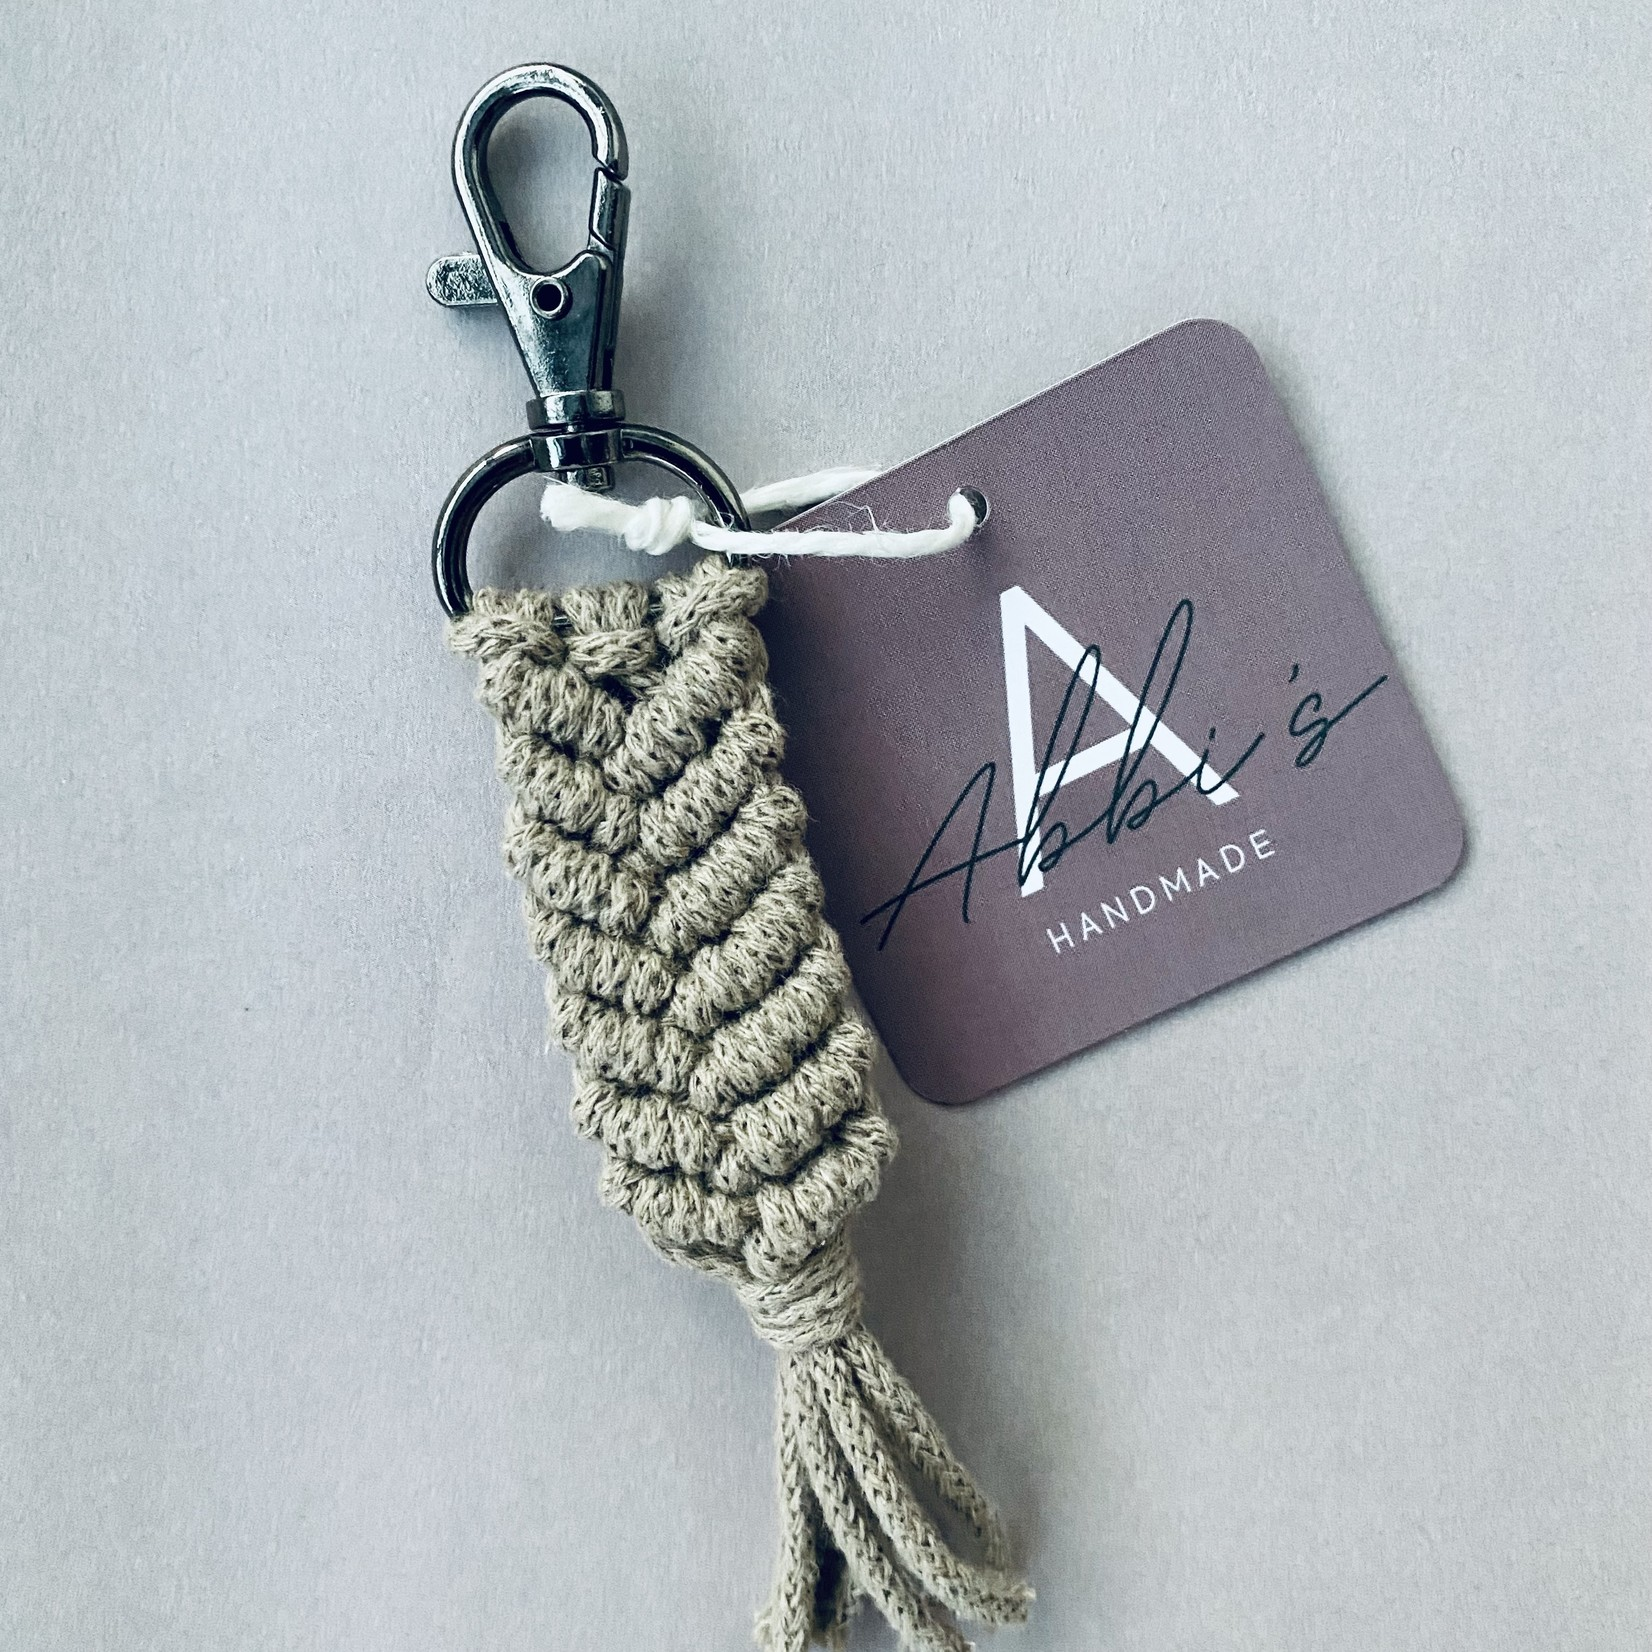 Abbi's Handmade Abbi's Handmade   Keychain Liam - Sand